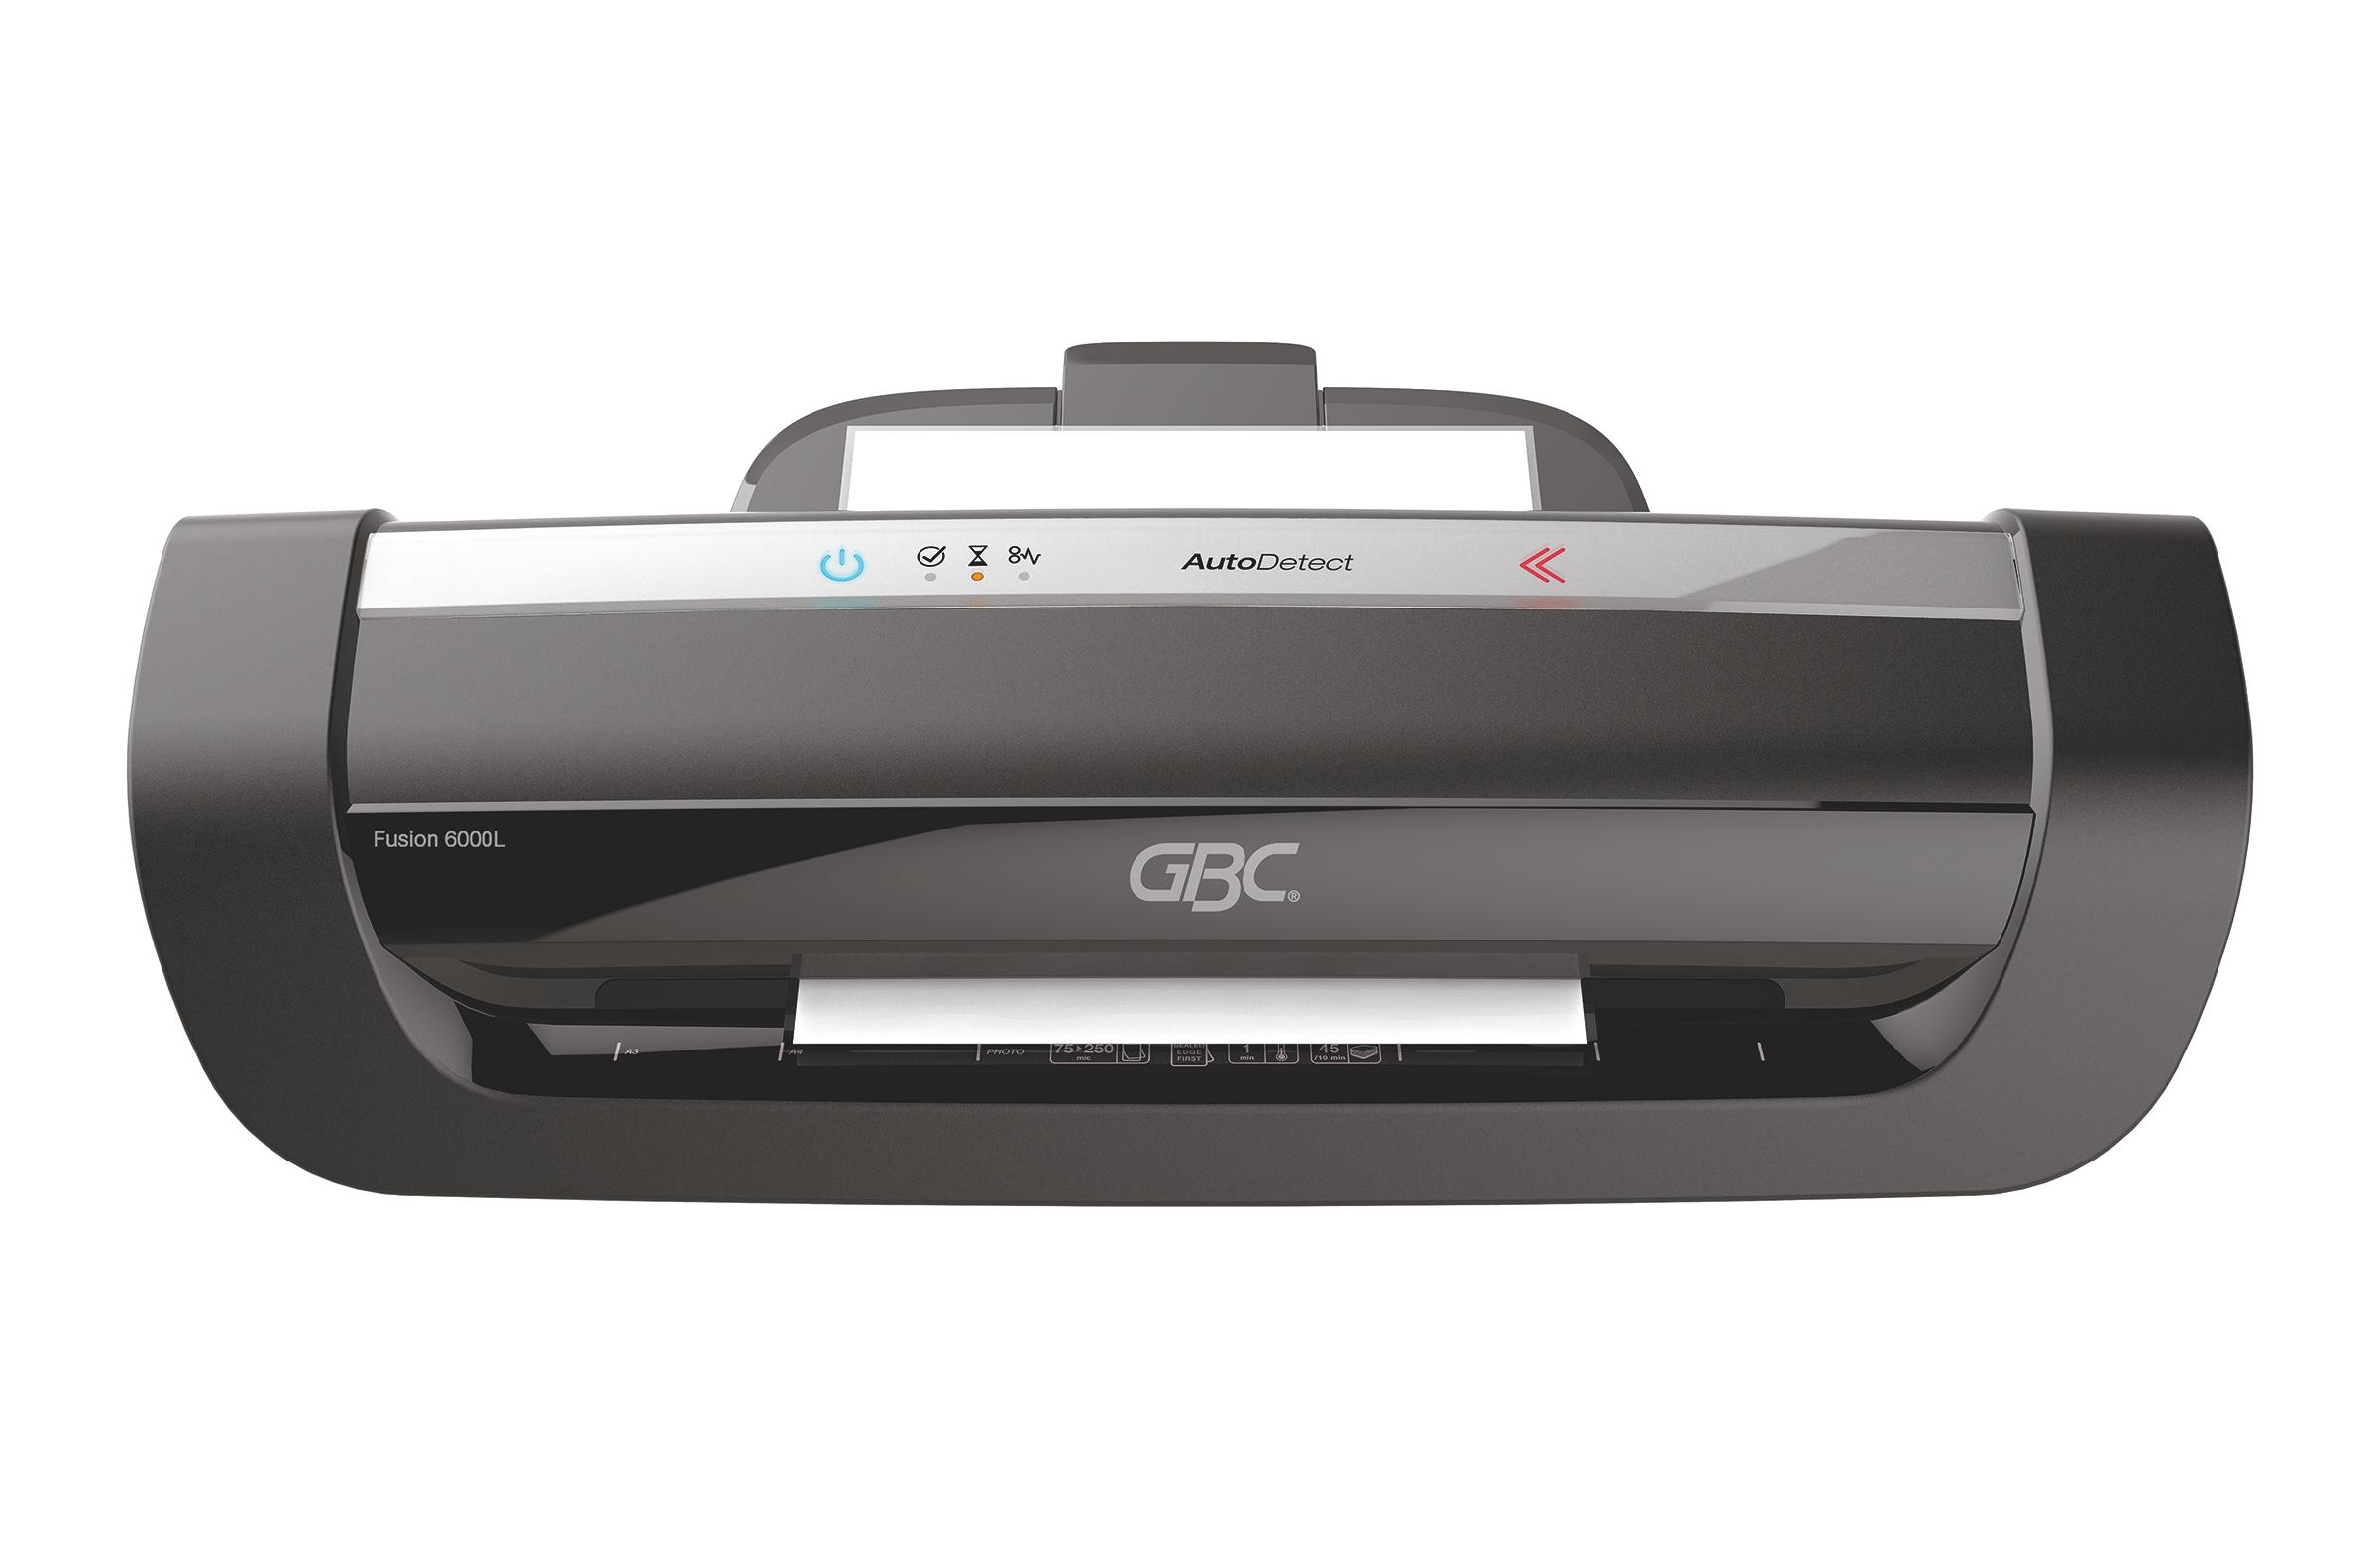 Laminating Machines GBC Fusion Plus 6000L A3 Laminator Black